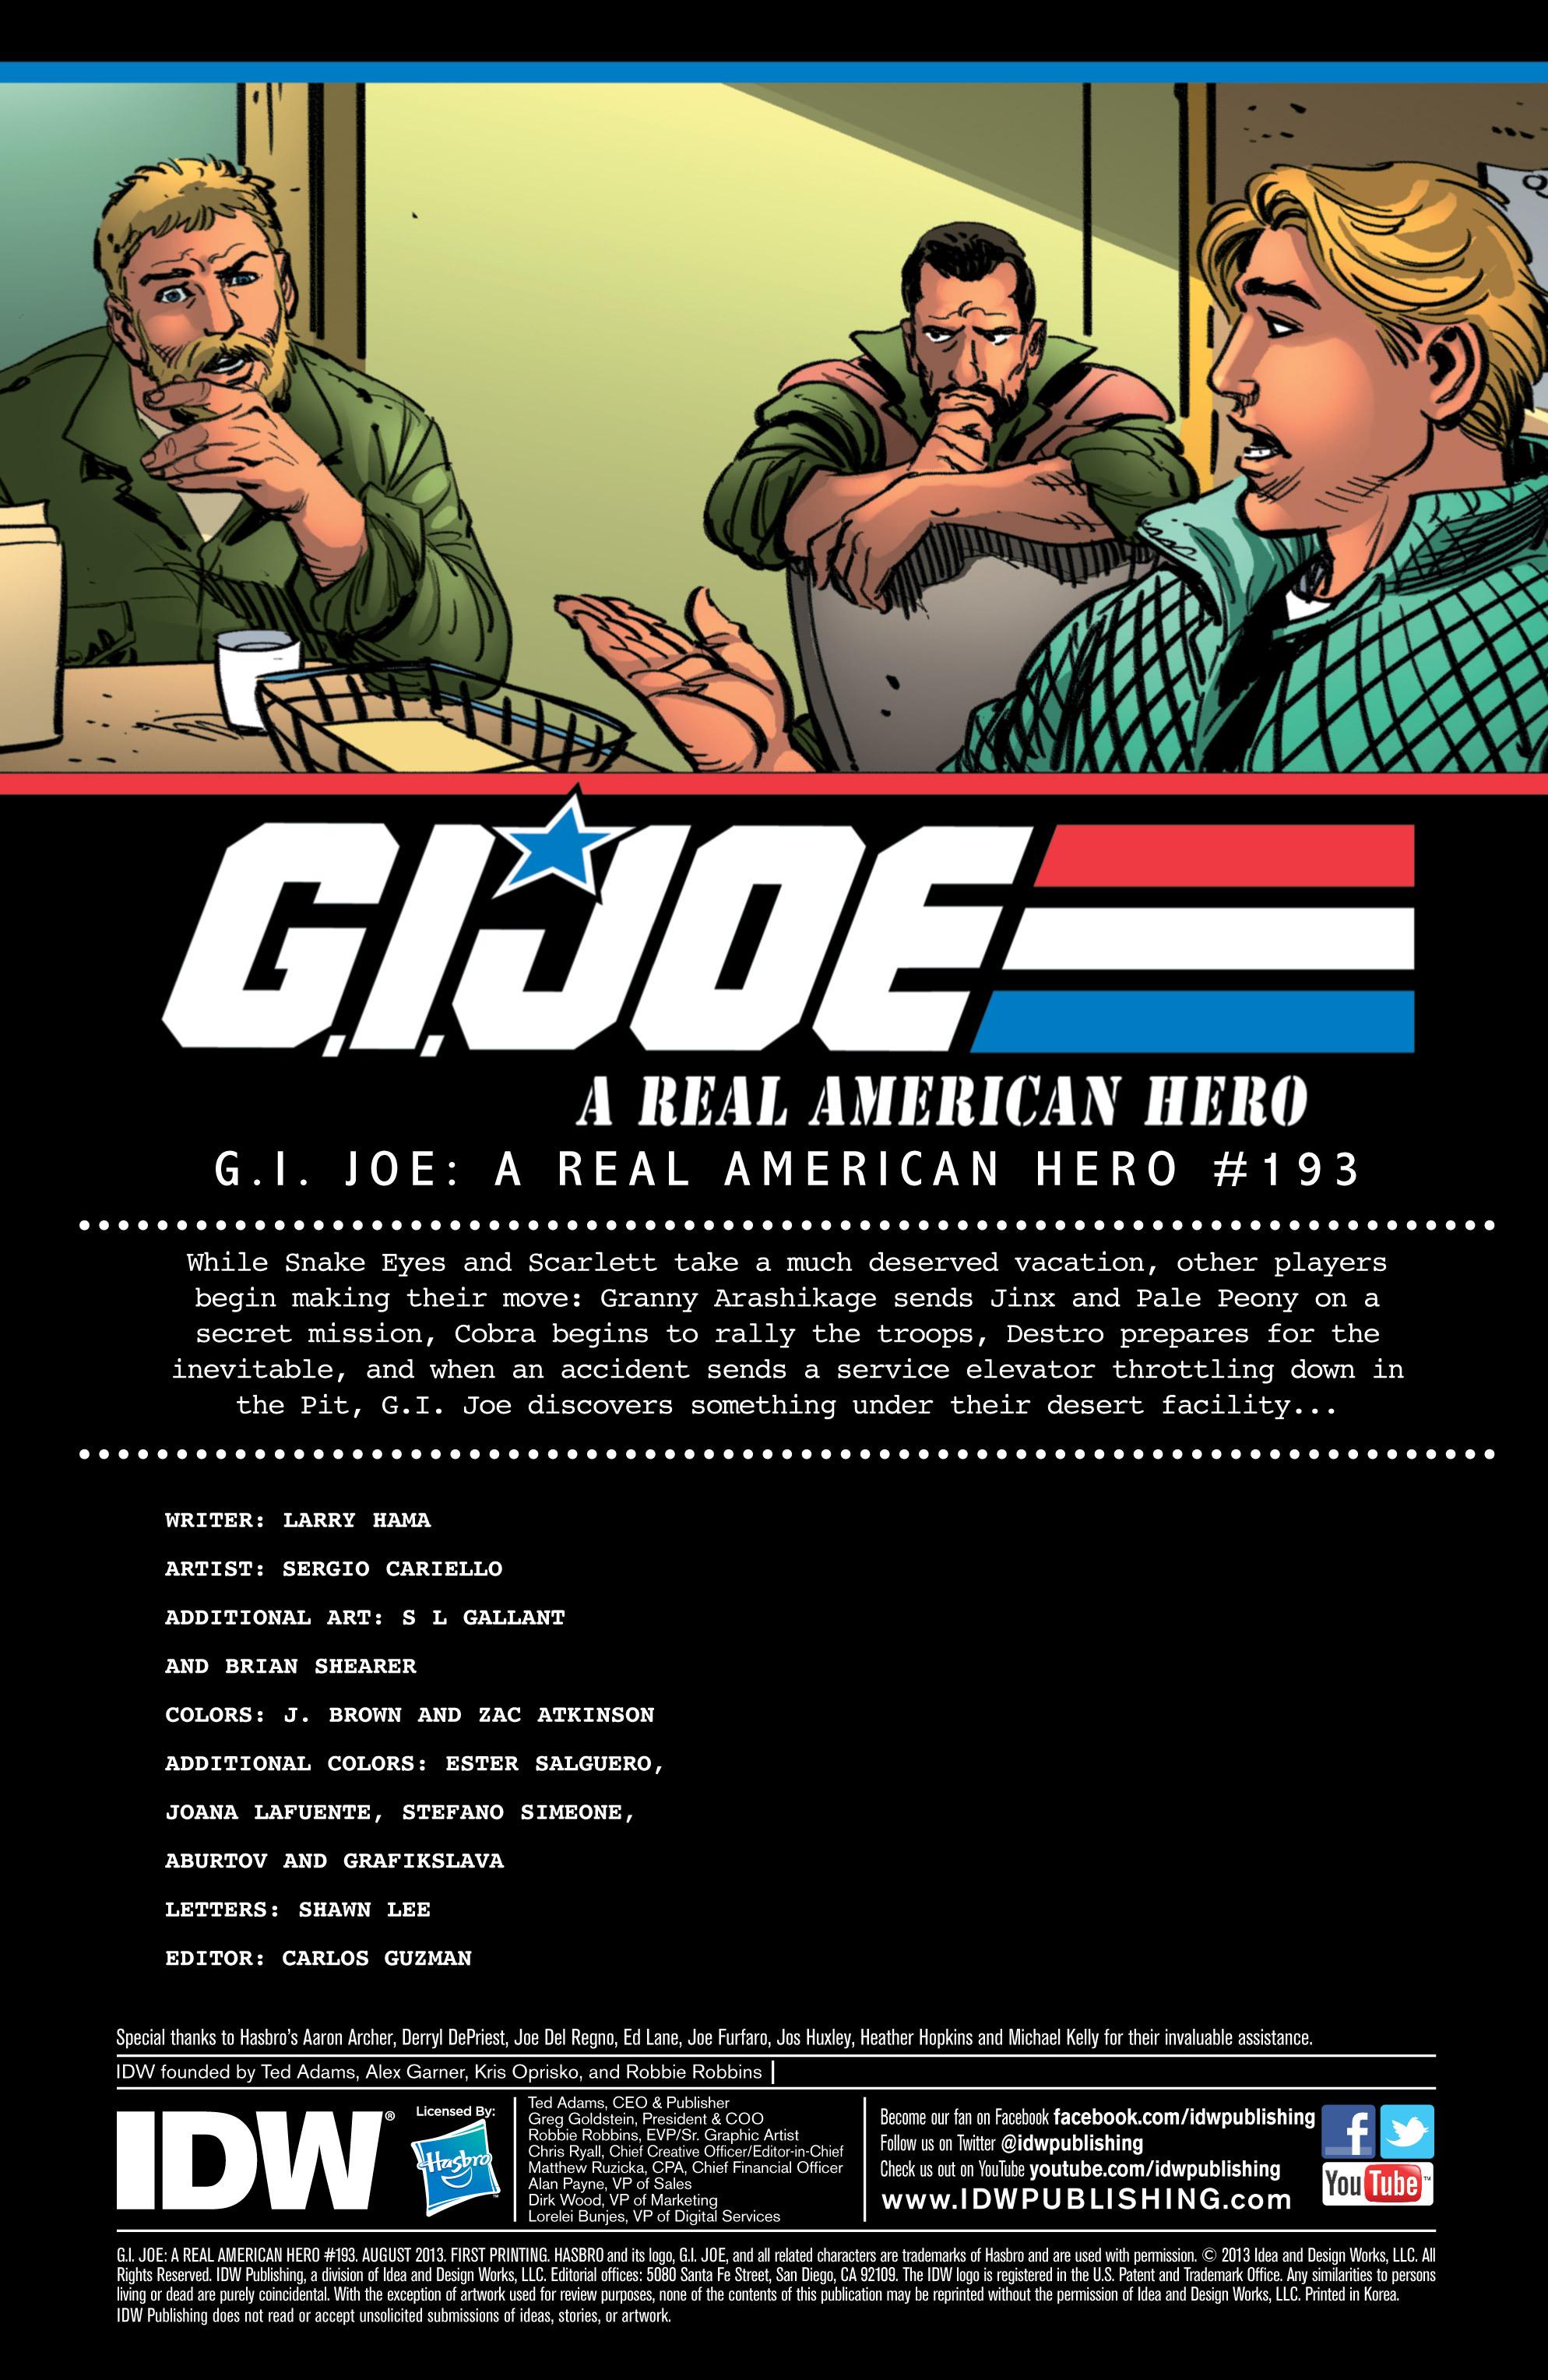 G.I. Joe: A Real American Hero 193 Page 1